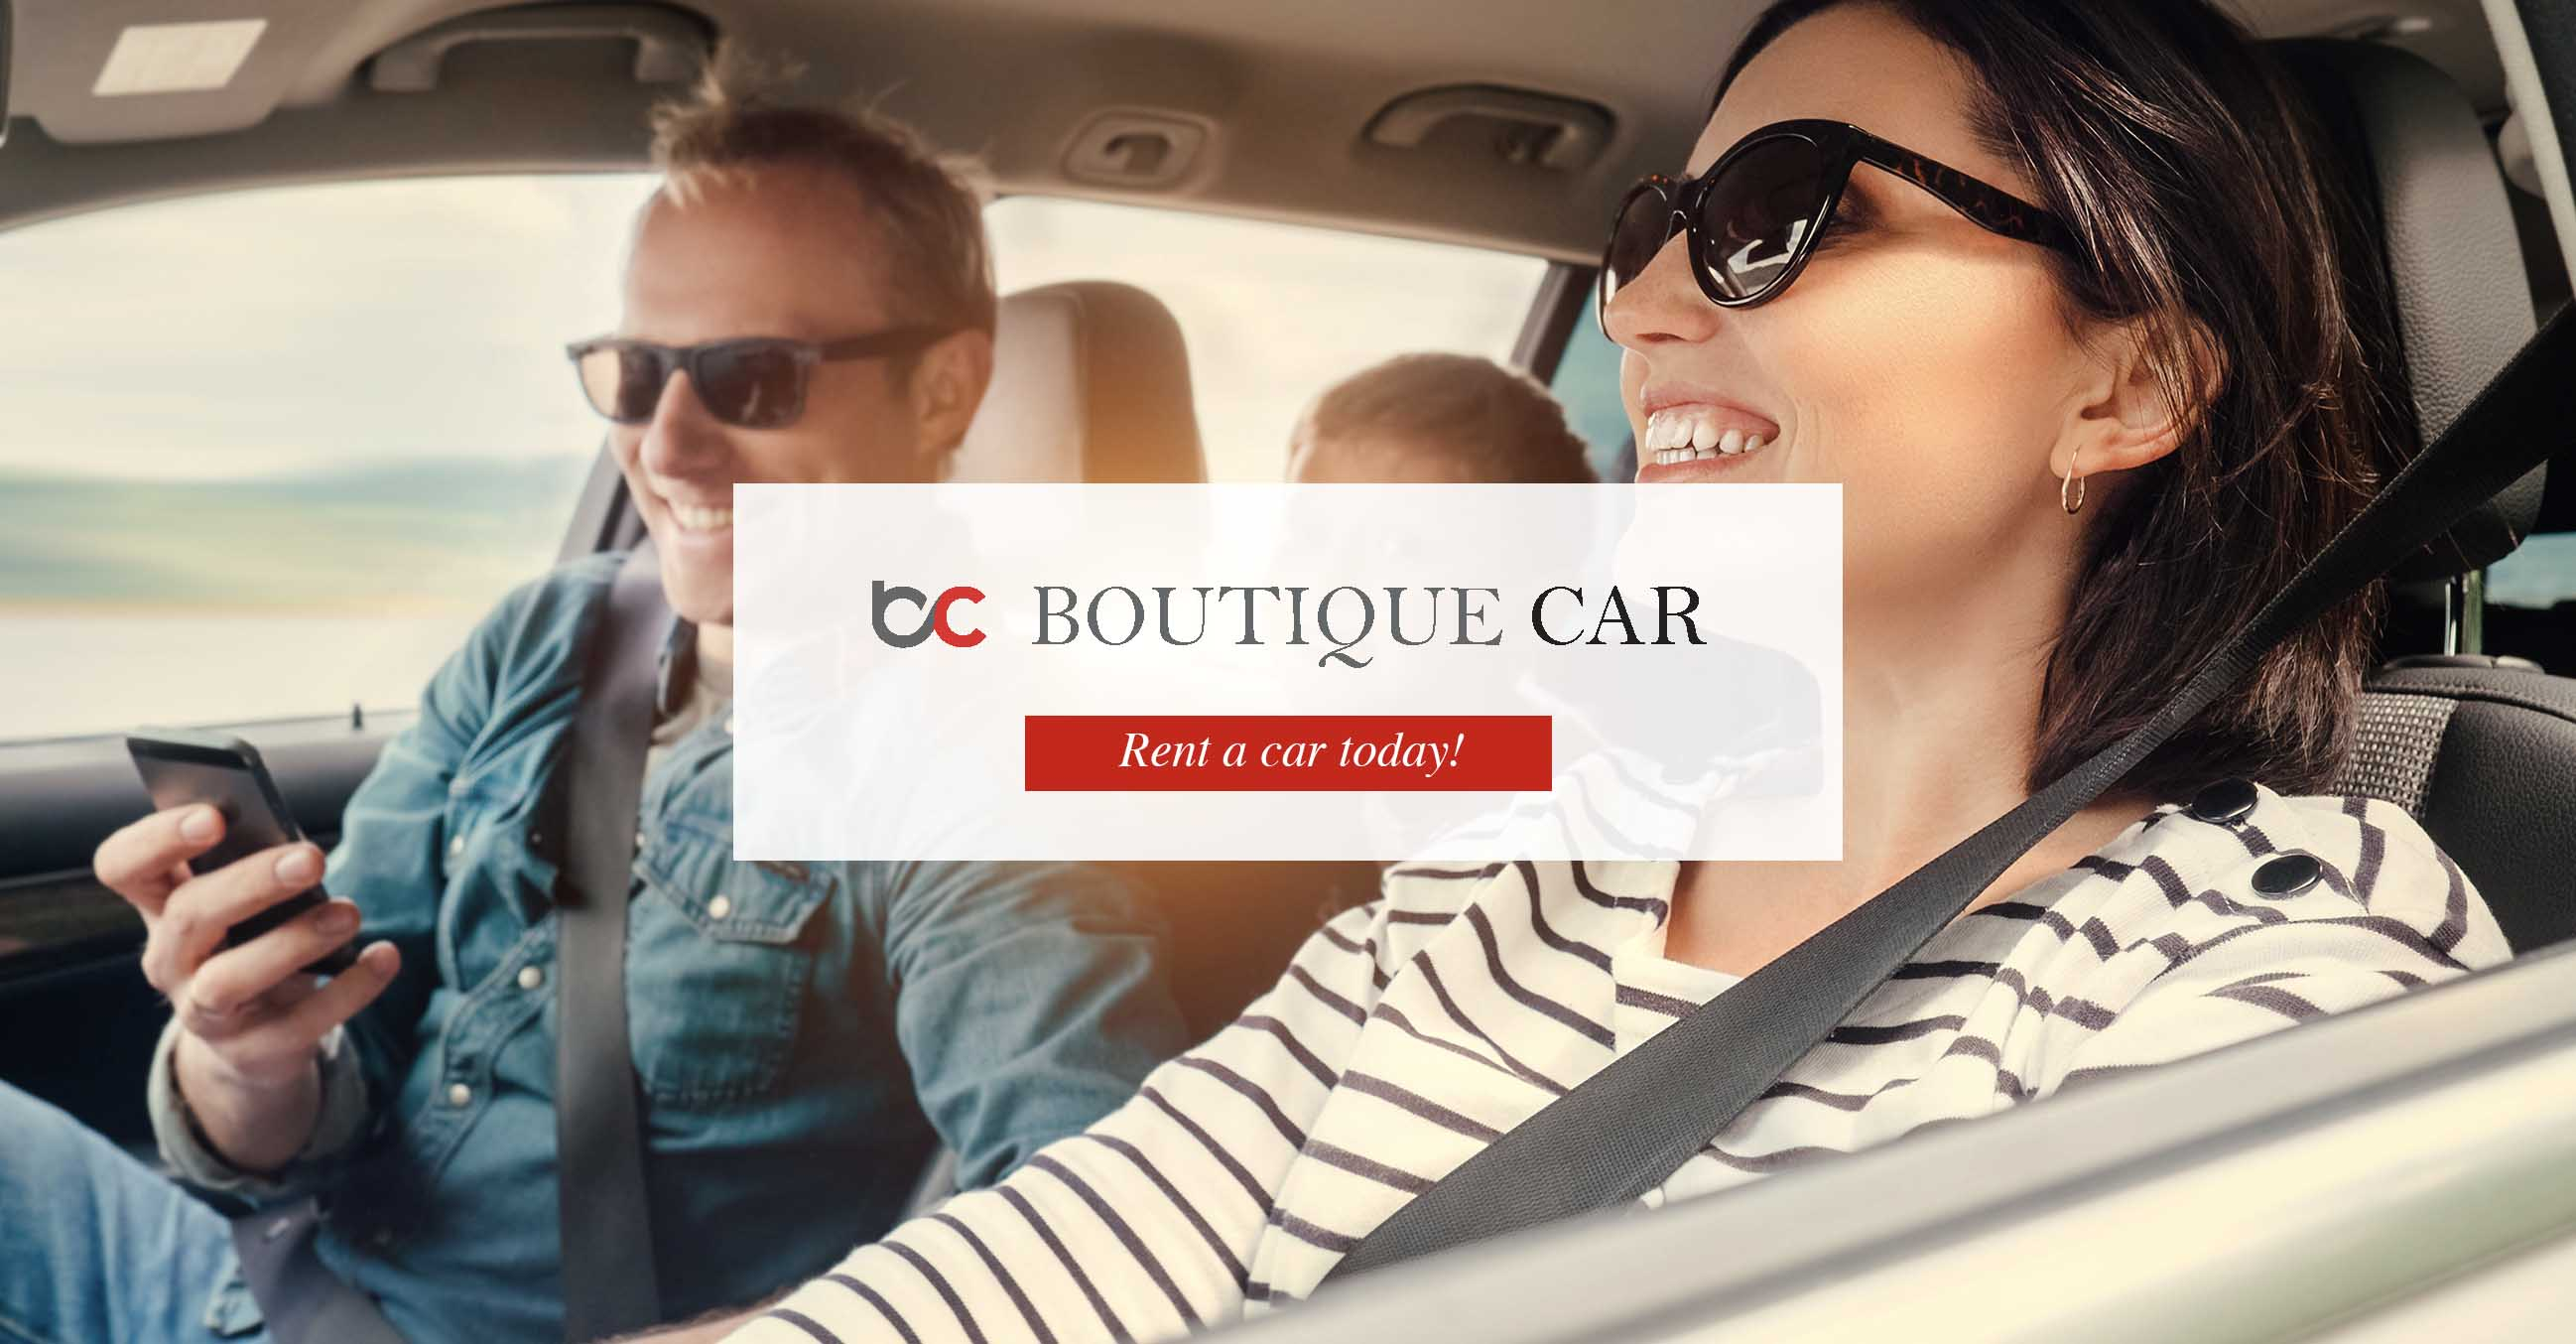 BoutiqueCar